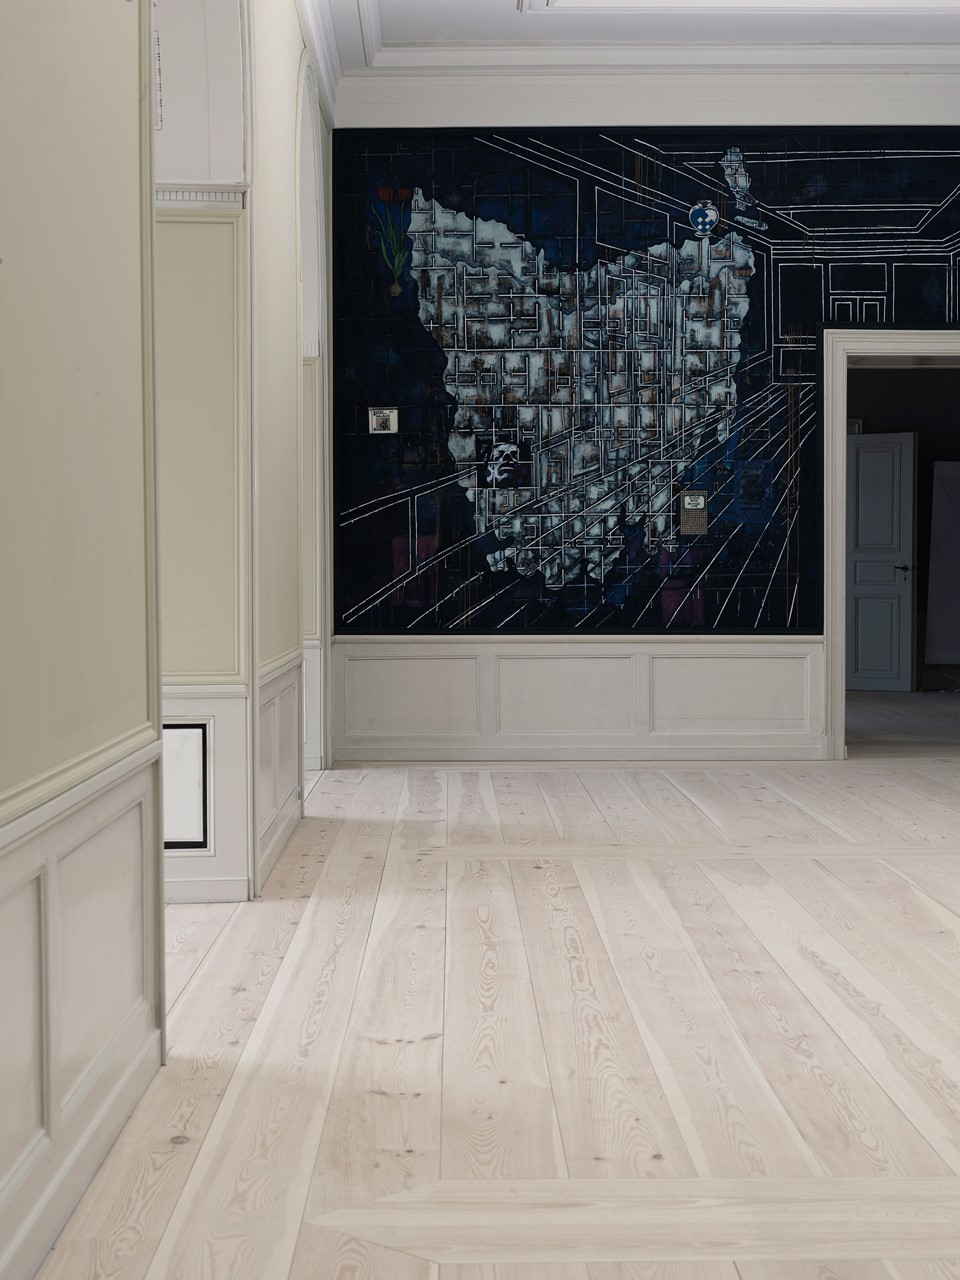 pine-plank-floor_natural-soap_frederik-viiis-palæ-amailienborg-castle_dinesen.jpg